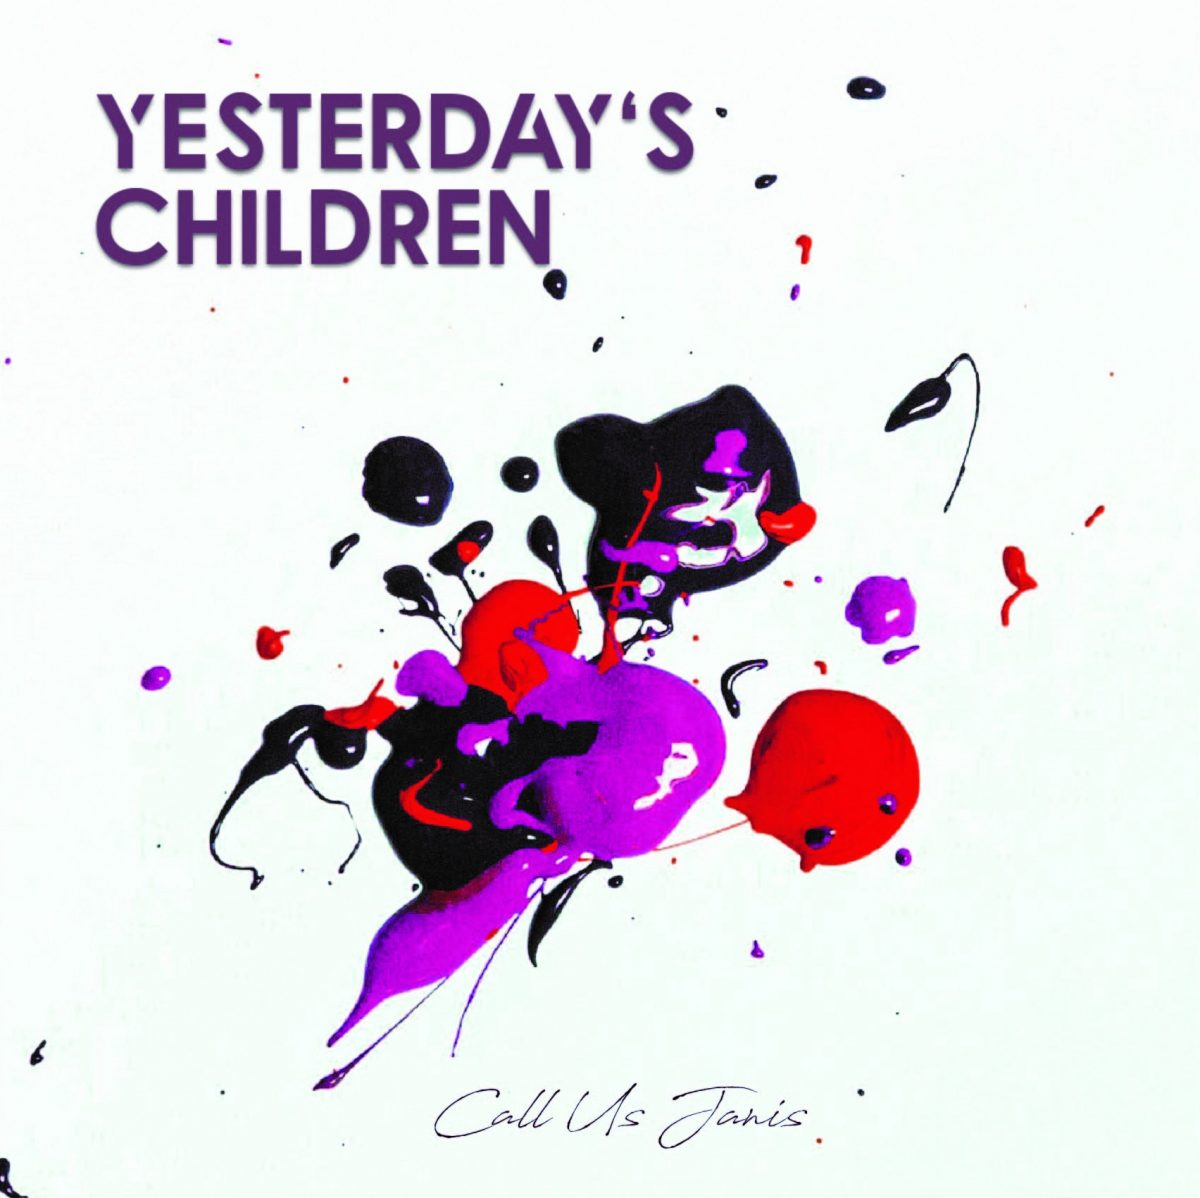 call-us-janis-yesterdays-children-ep-review